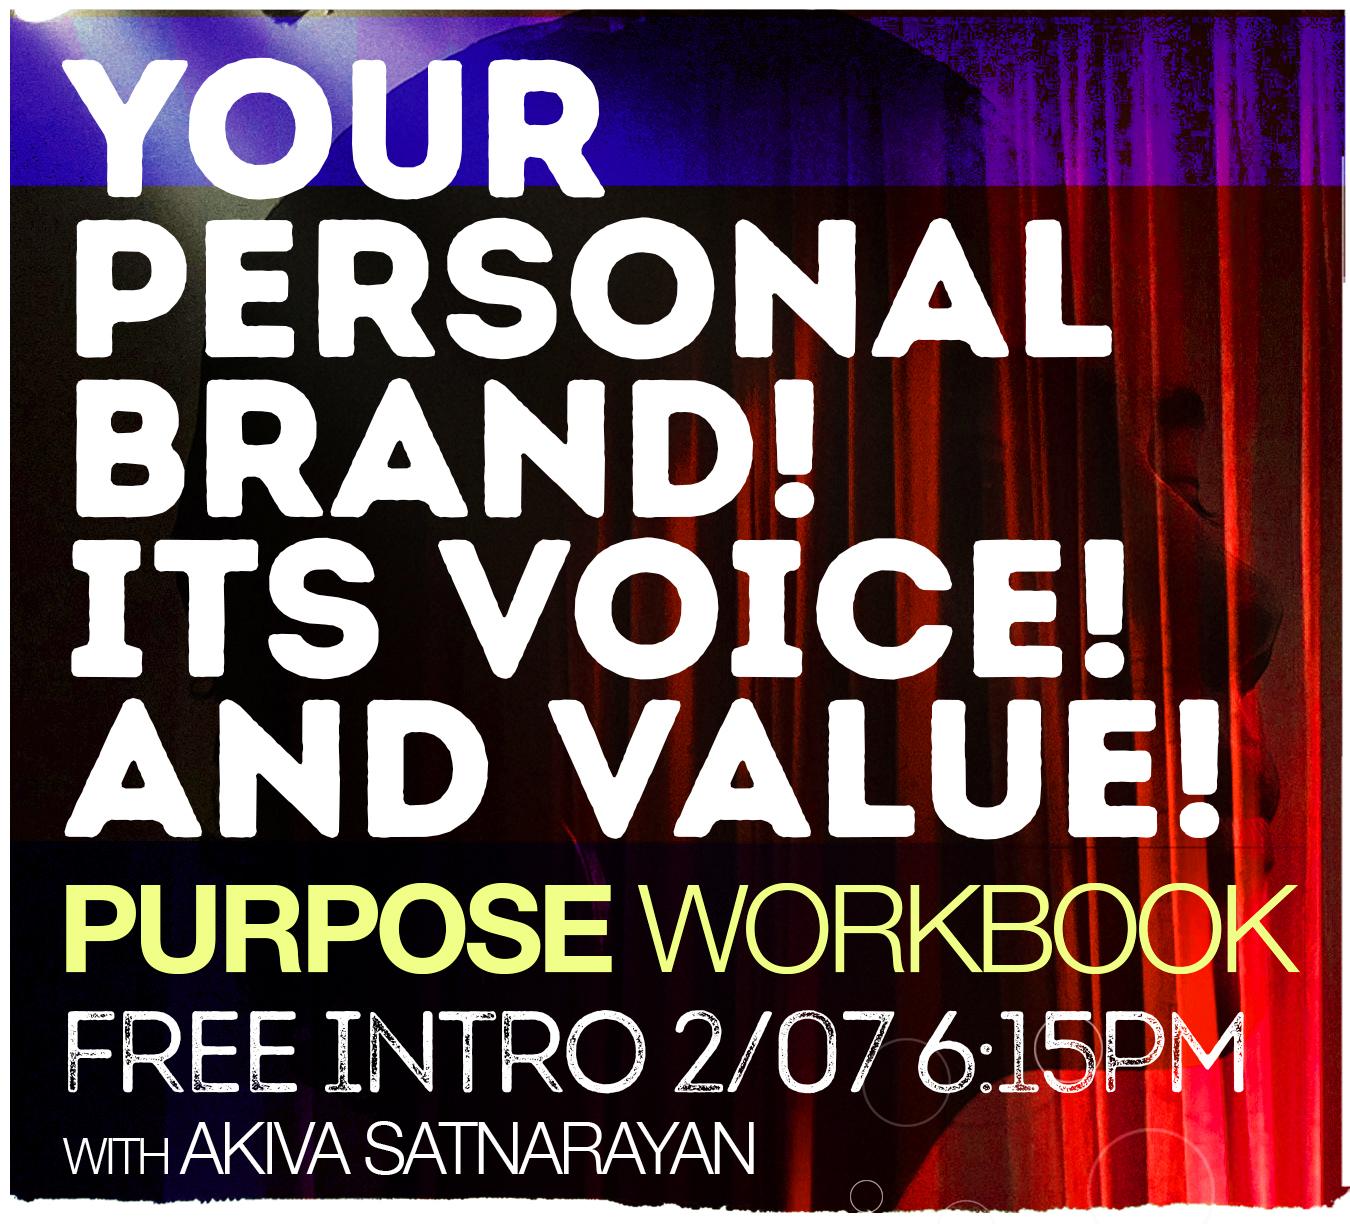 Personal_Brand_Value_square.jpg